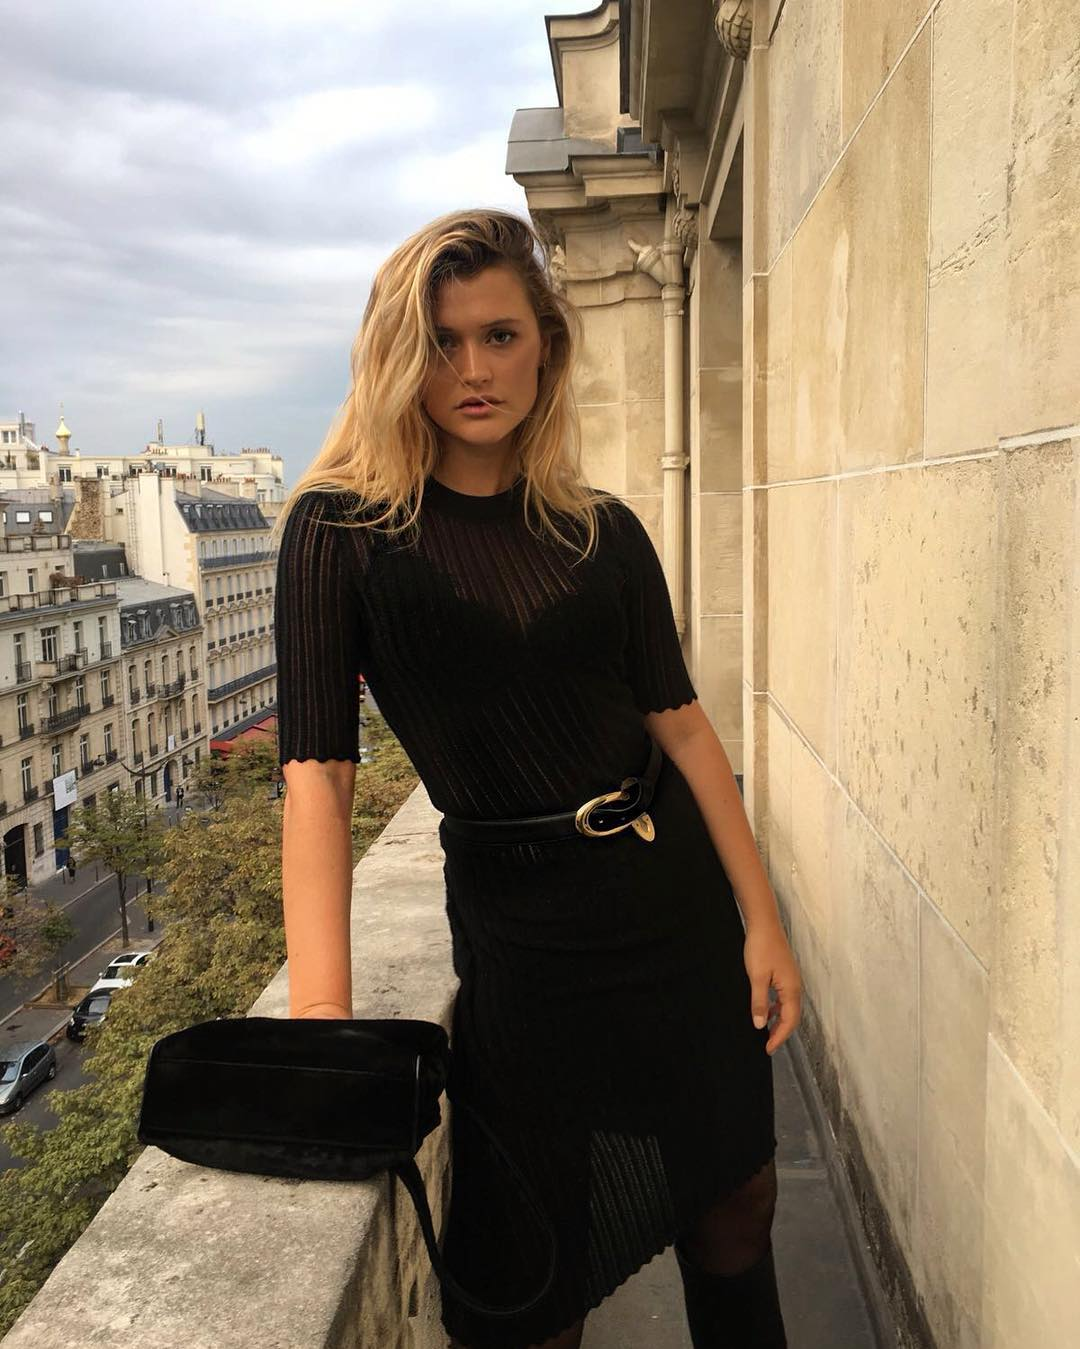 Chloe Lecareux